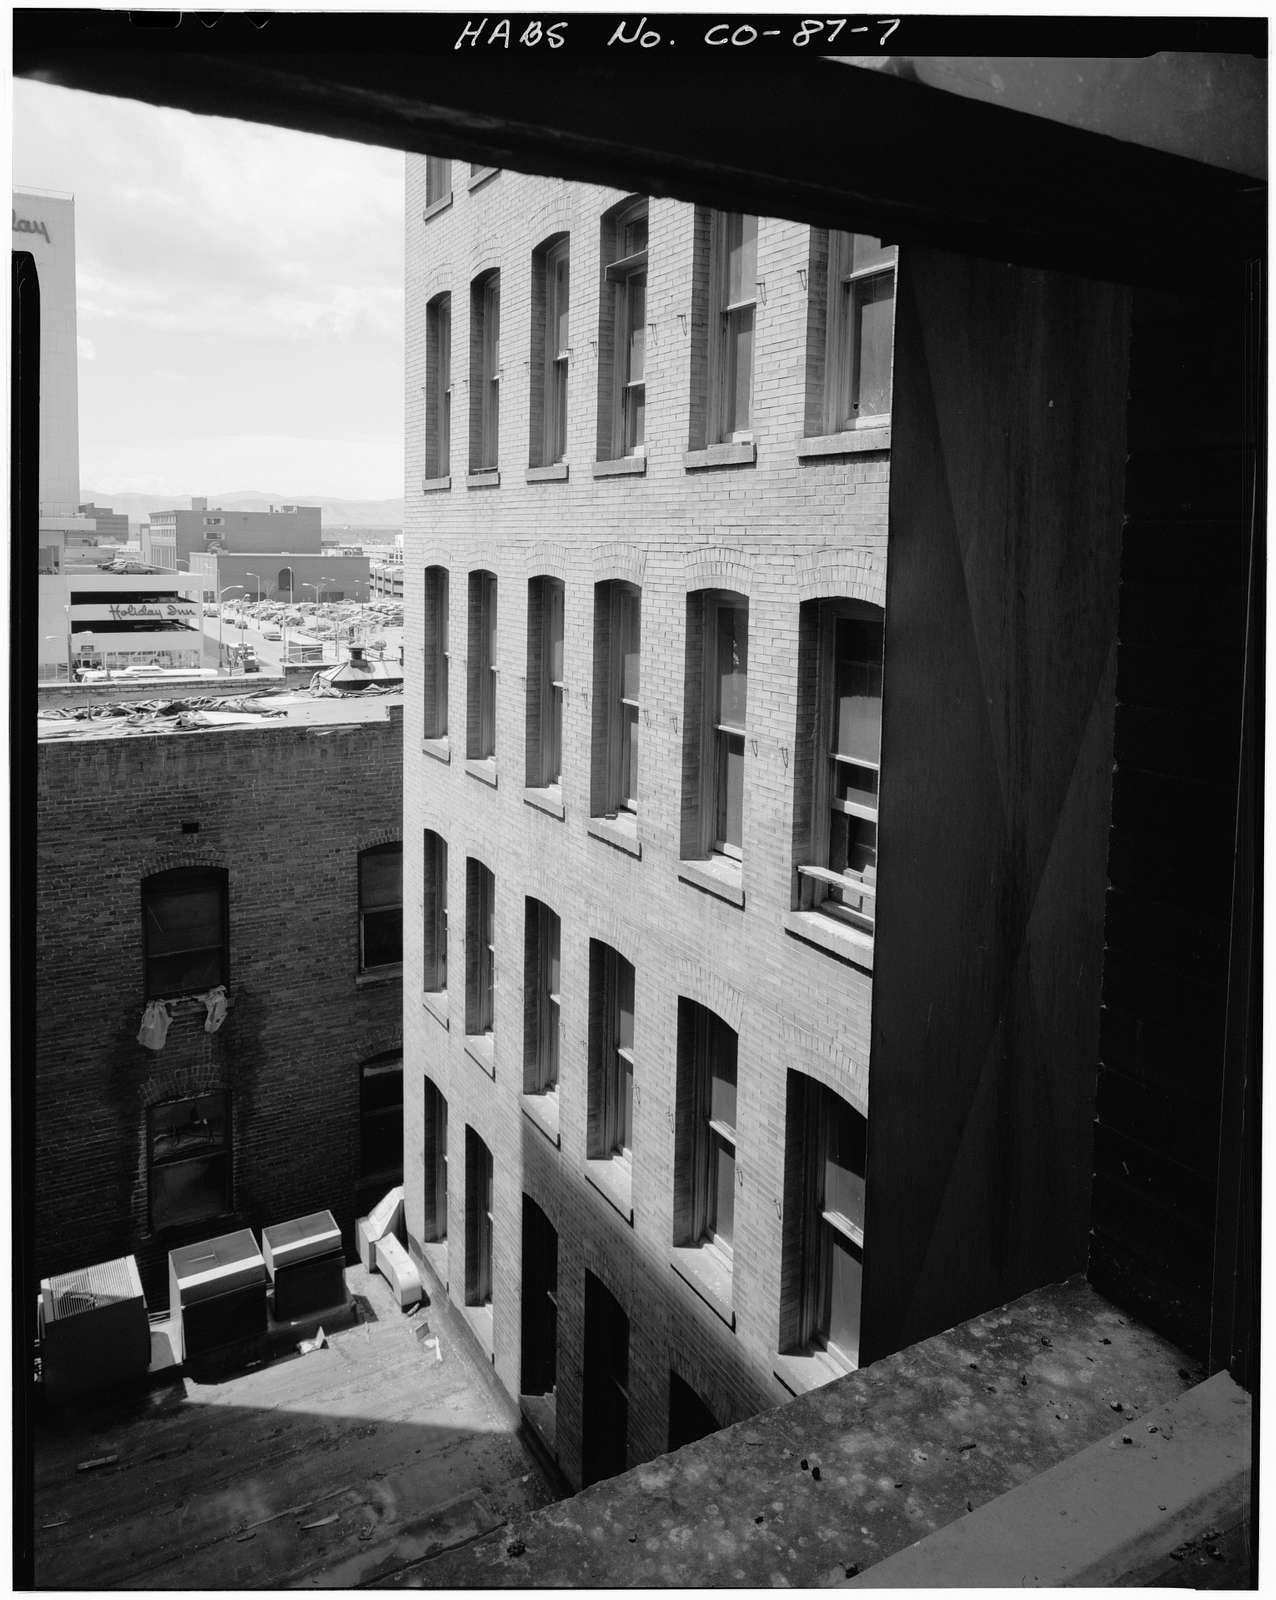 Empire Building, 430 Sixteenth Street, South Corner of Sixteenth Street & Glenarm Place, Denver, Denver County, CO